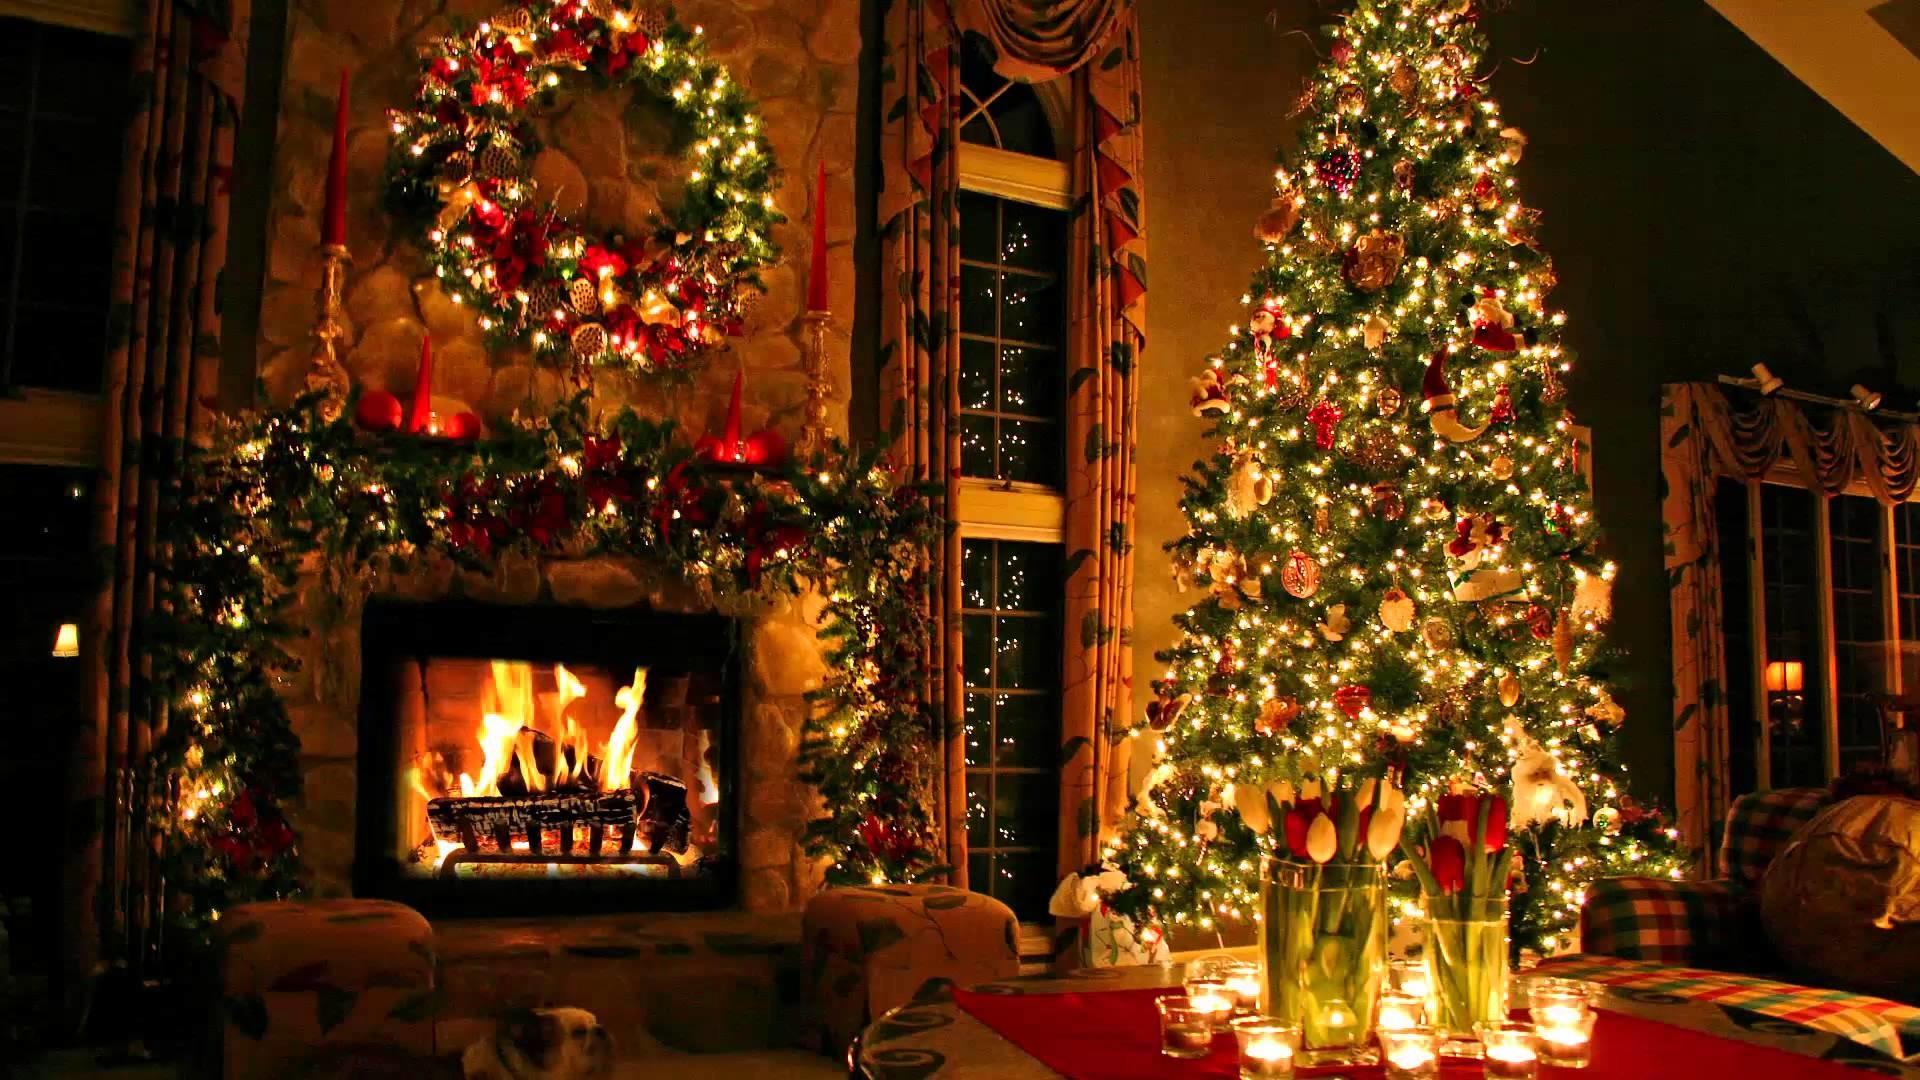 1920x1200 Magic Christmas · Download · 1920x1200 Animated Christmas Backgrounds For Desktop ...